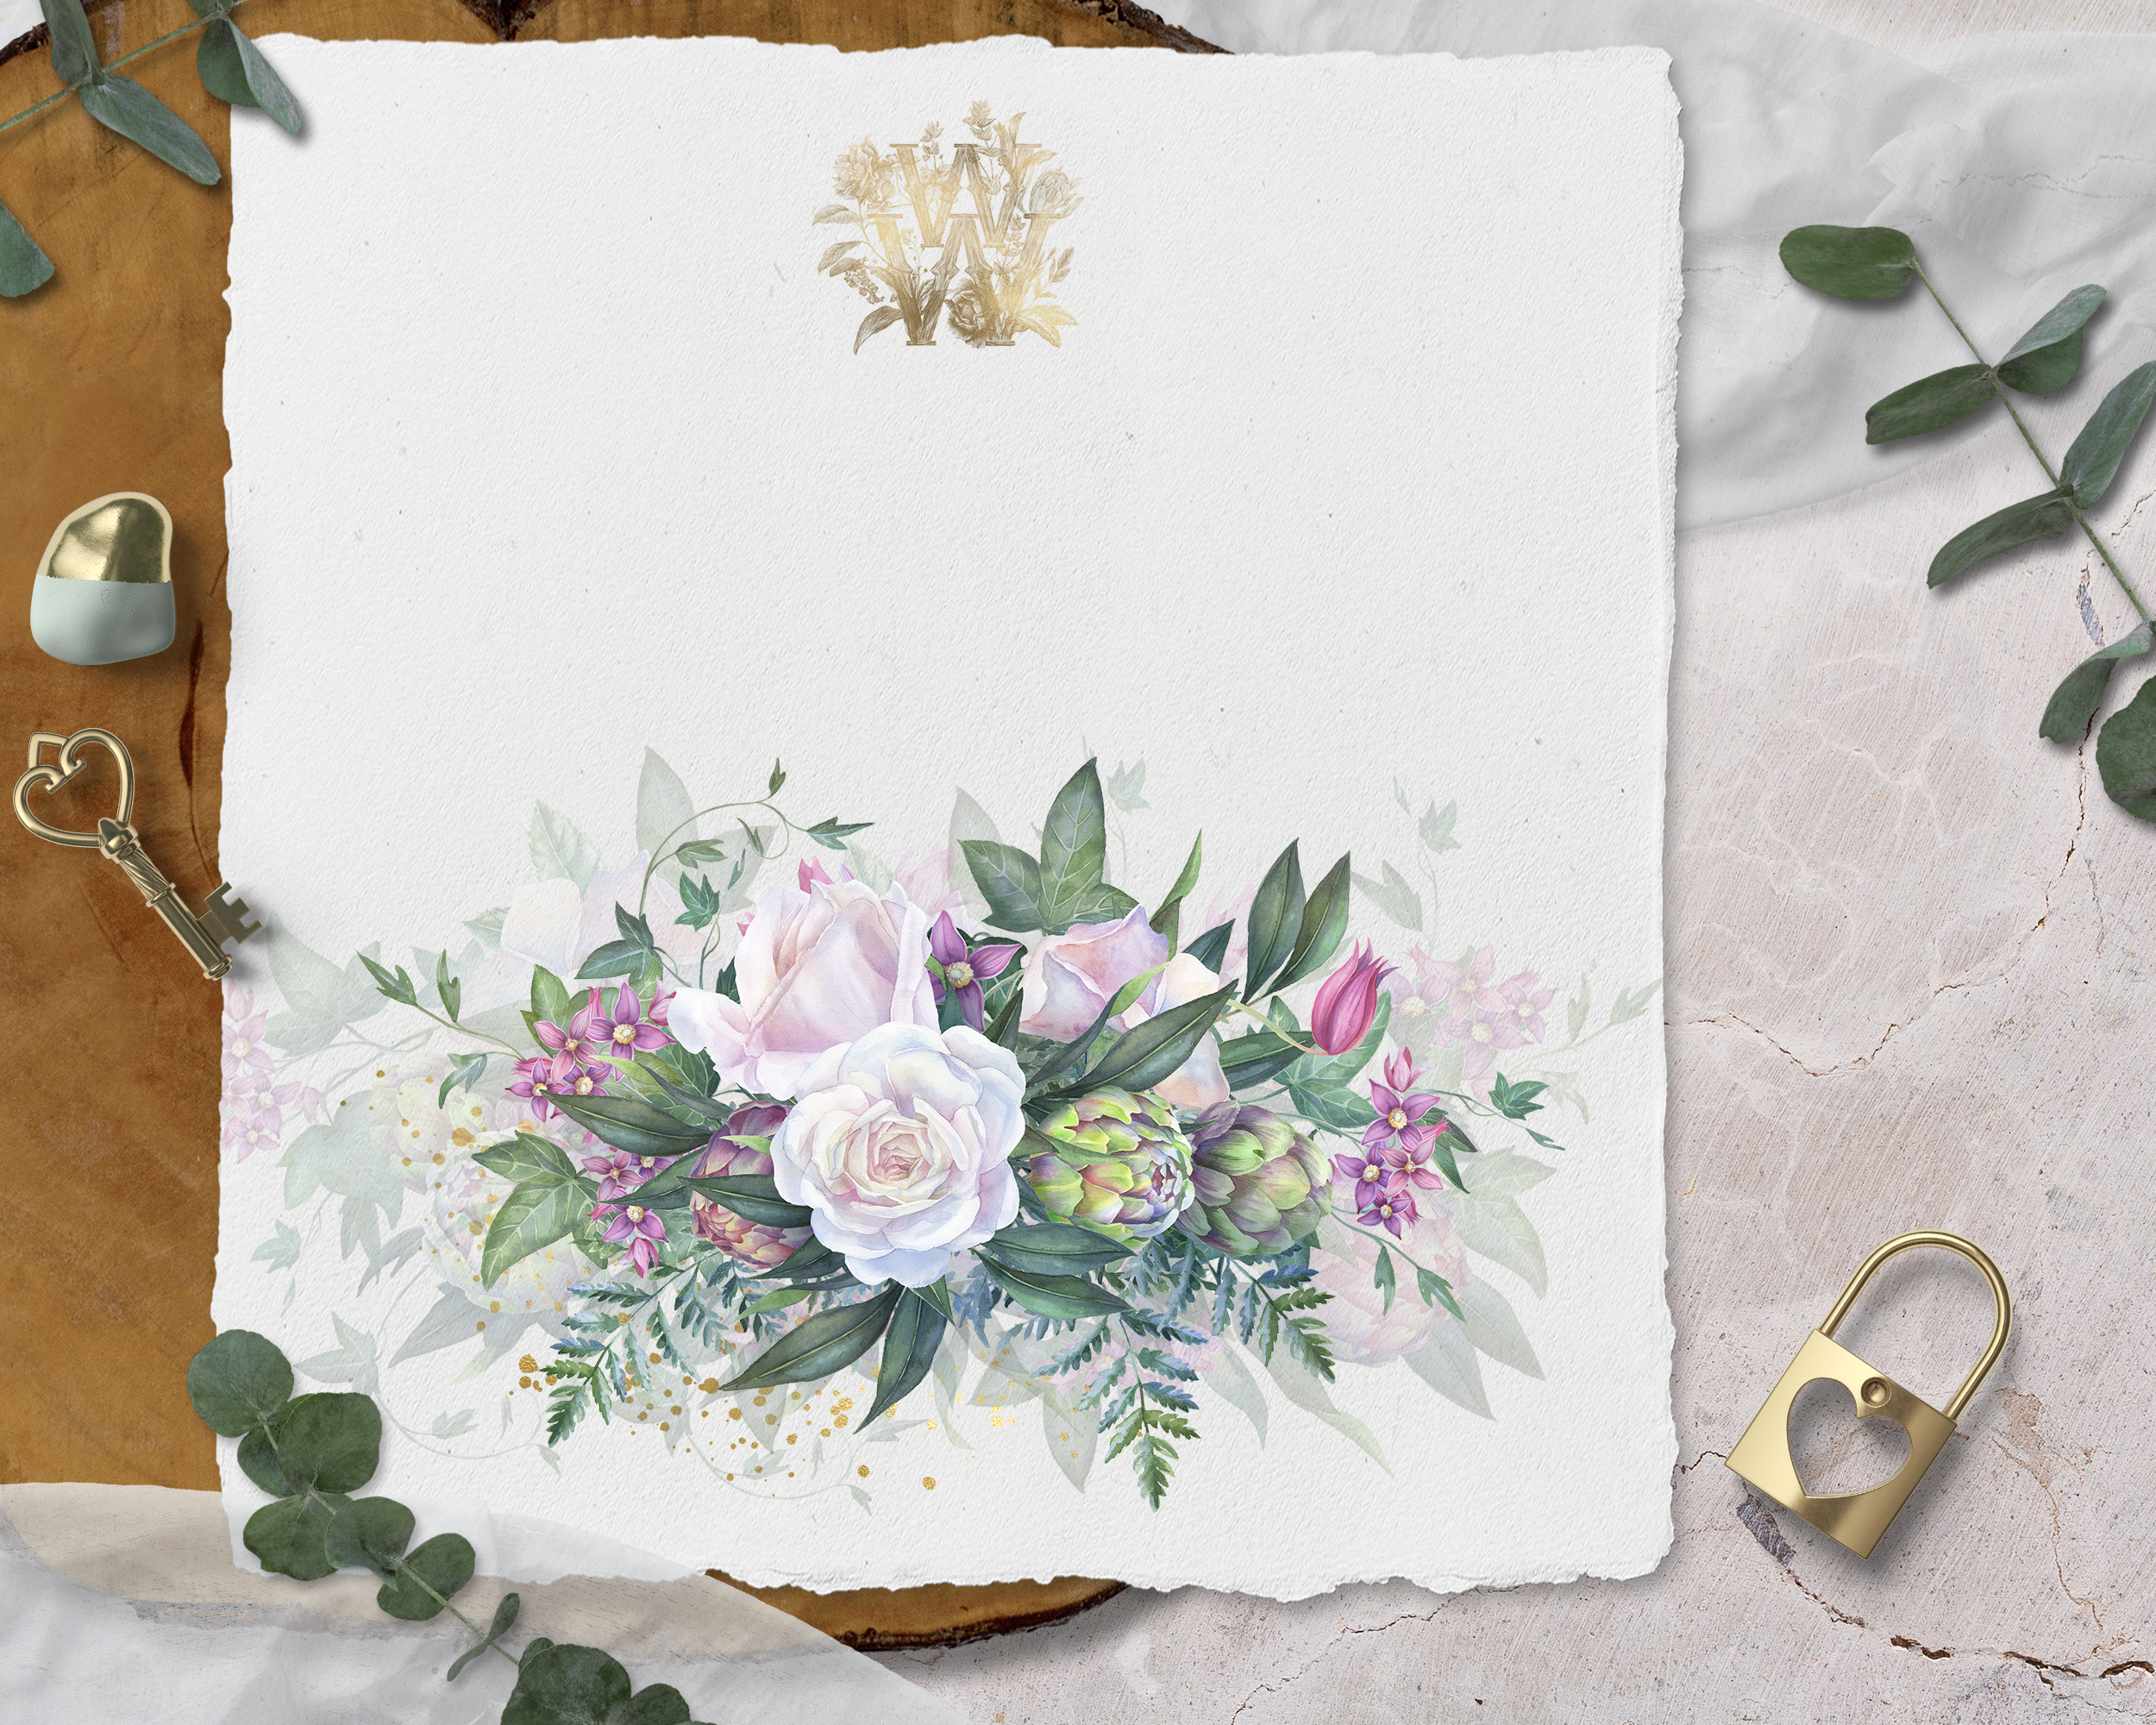 White rose wedding frame clip art example image 5